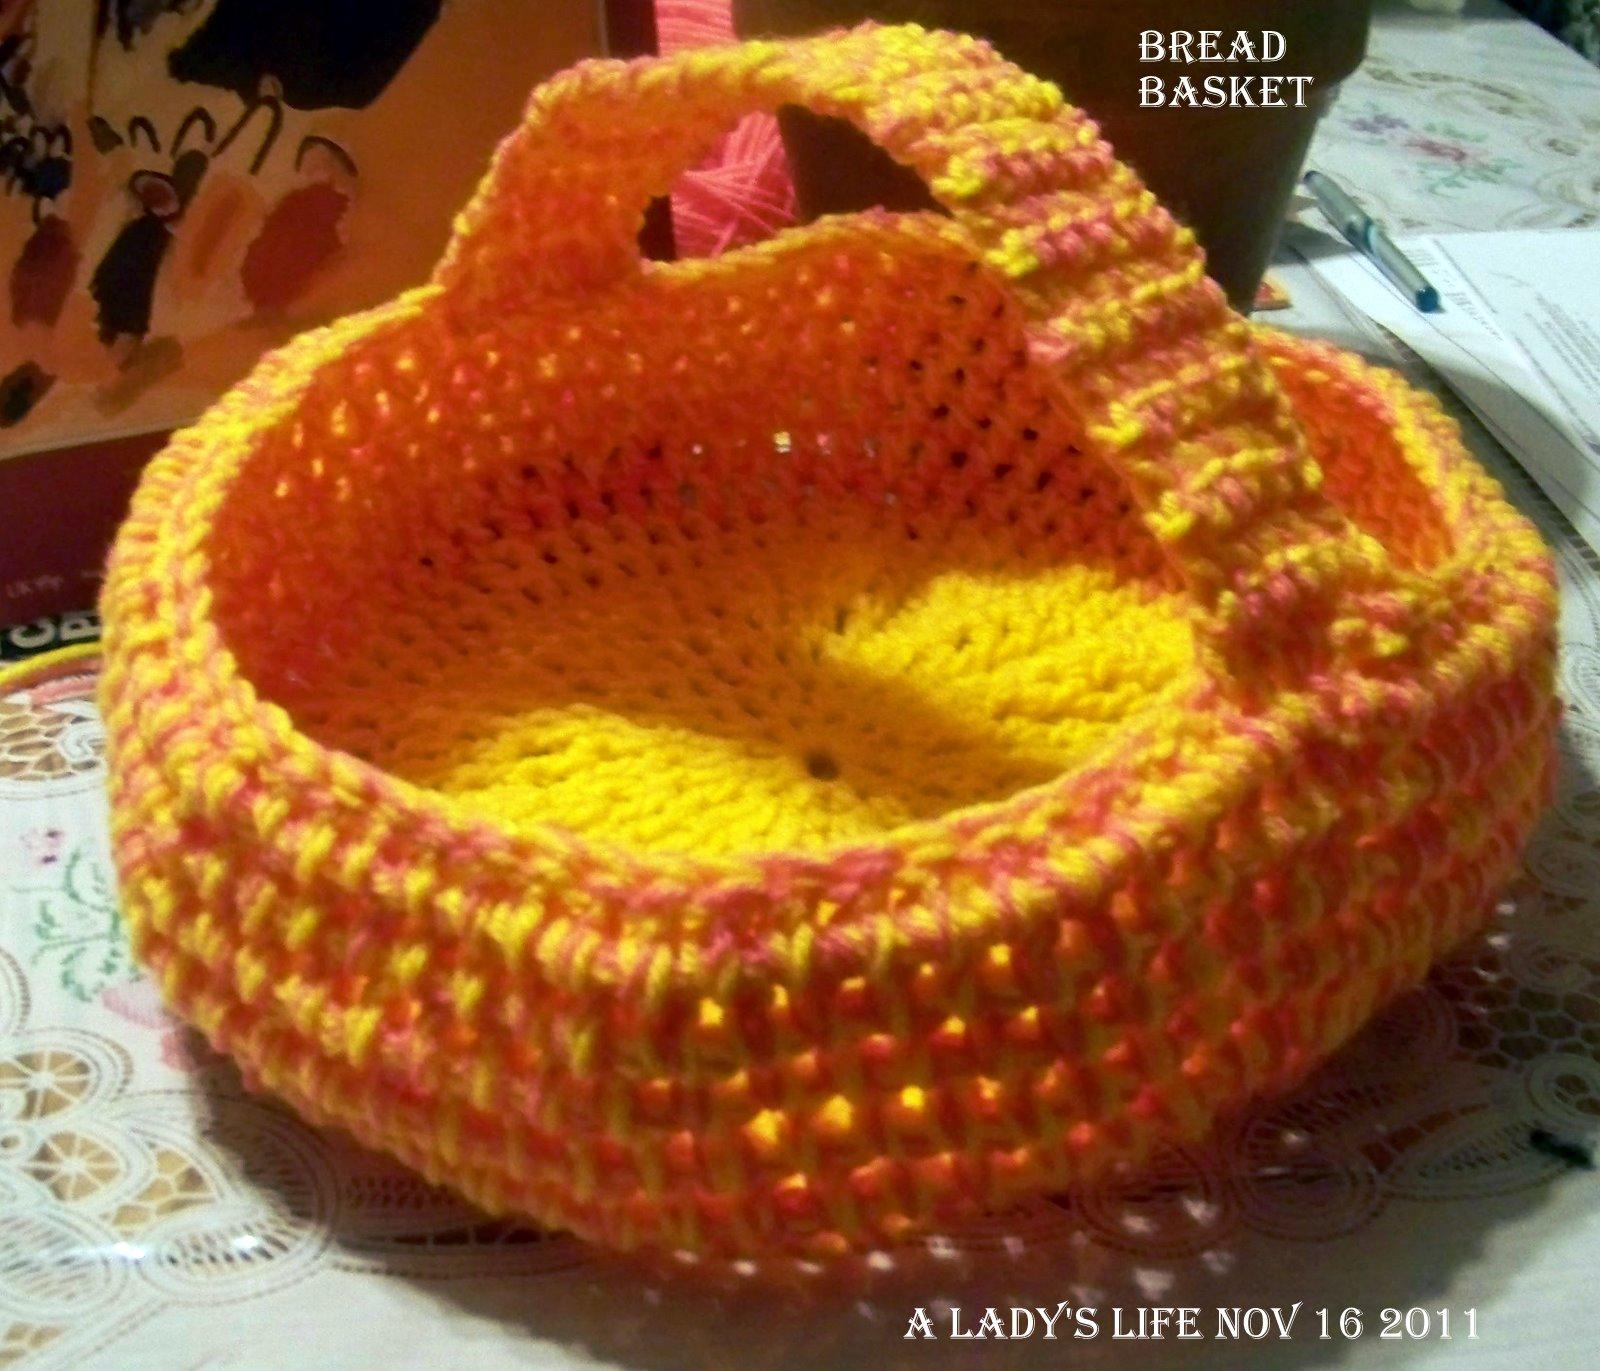 A Ladys Life...: Crochet Bread Basket